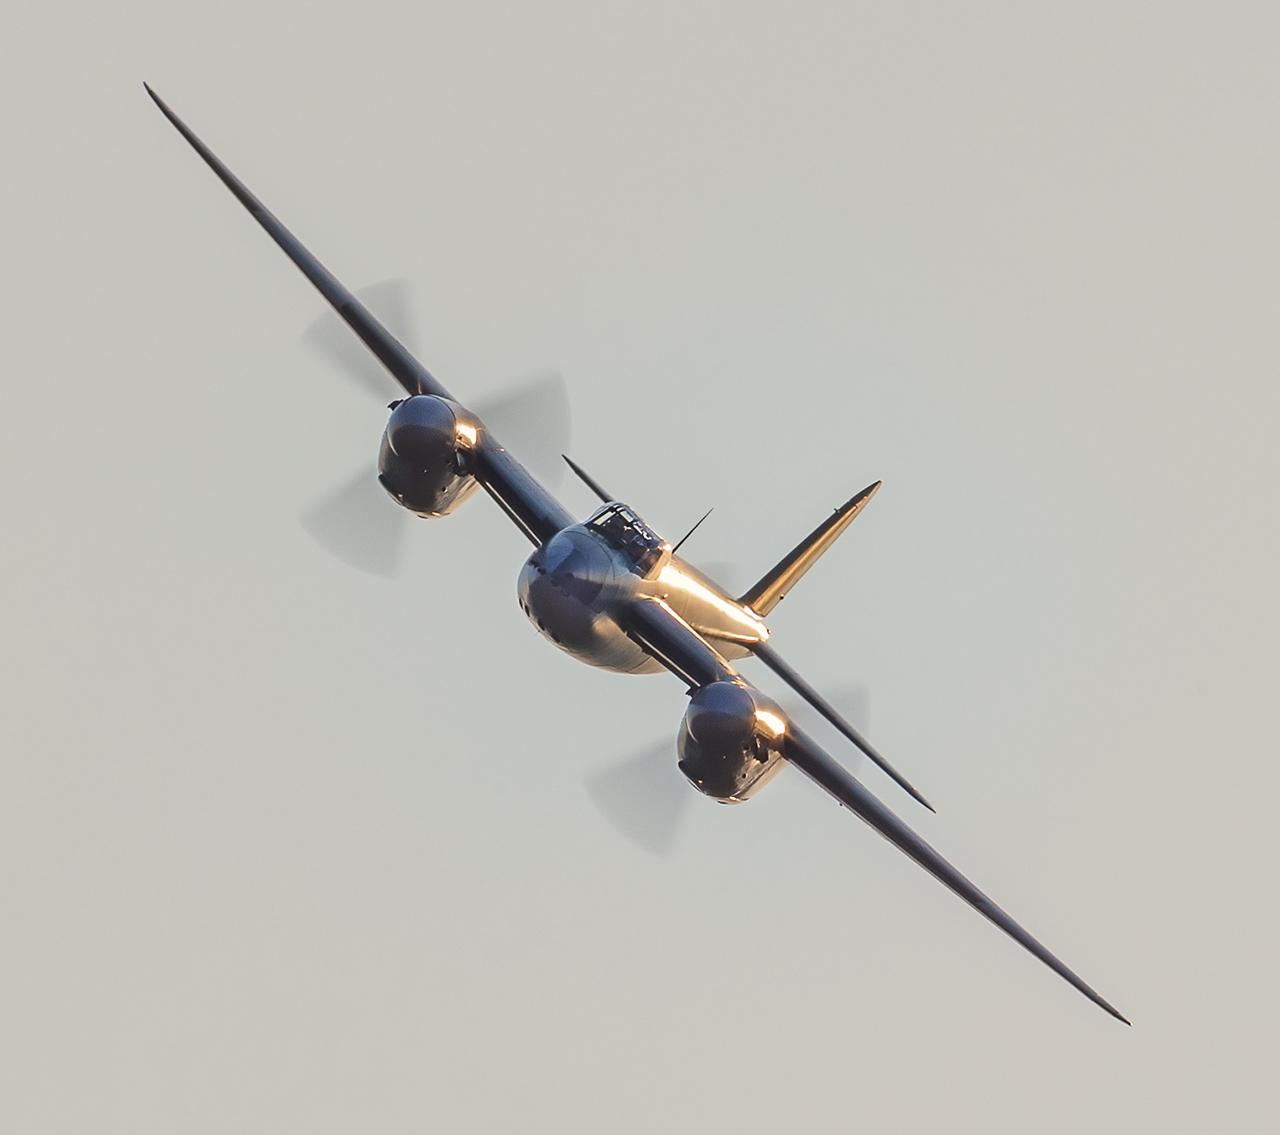 IMAGE: http://markfingar.com/photogallery/Aircraft/MAM_WOTB_2016/Proms/Mos-fb1.jpg